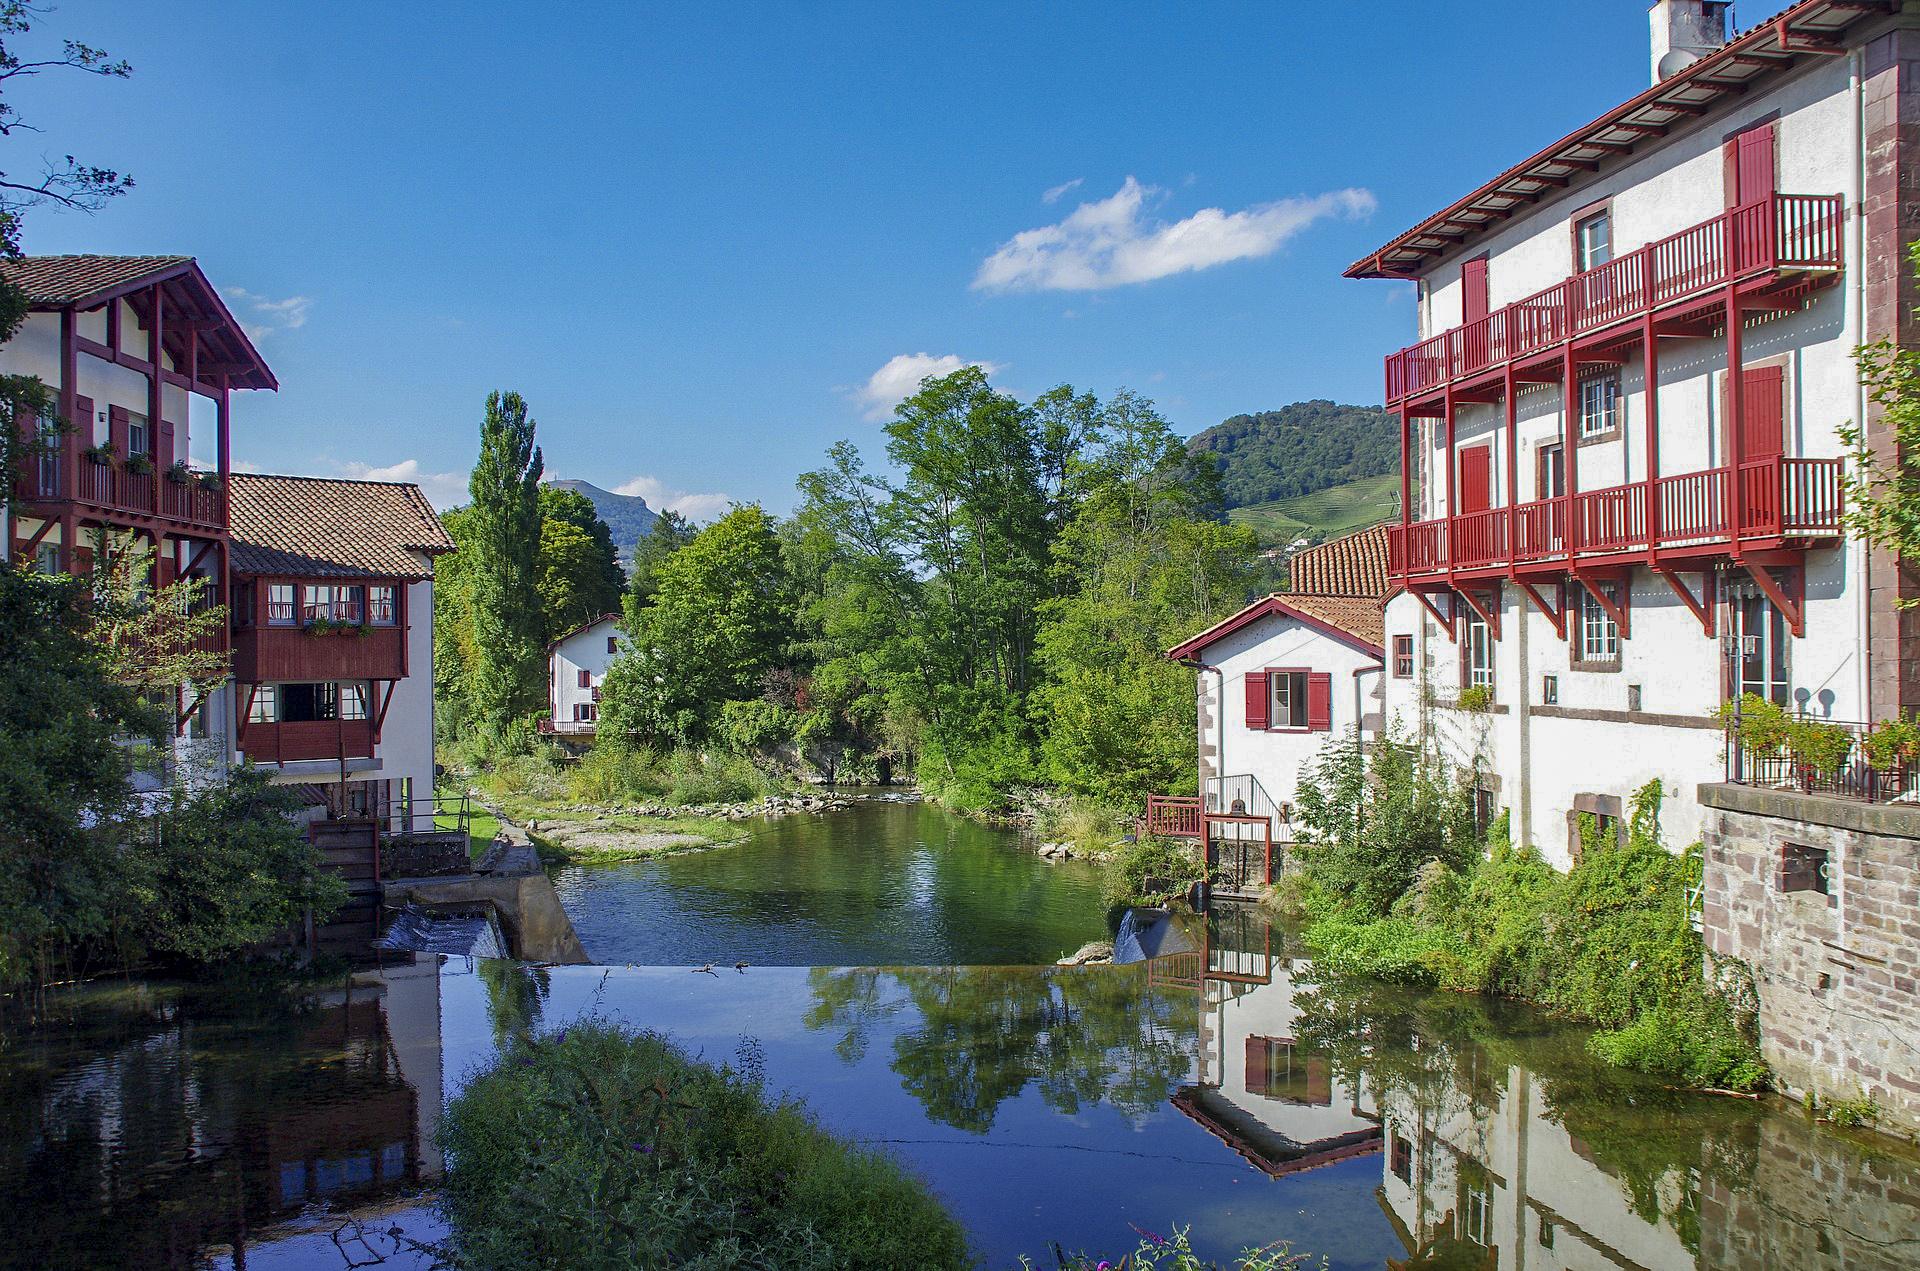 Ventes immobilières Pays Basque